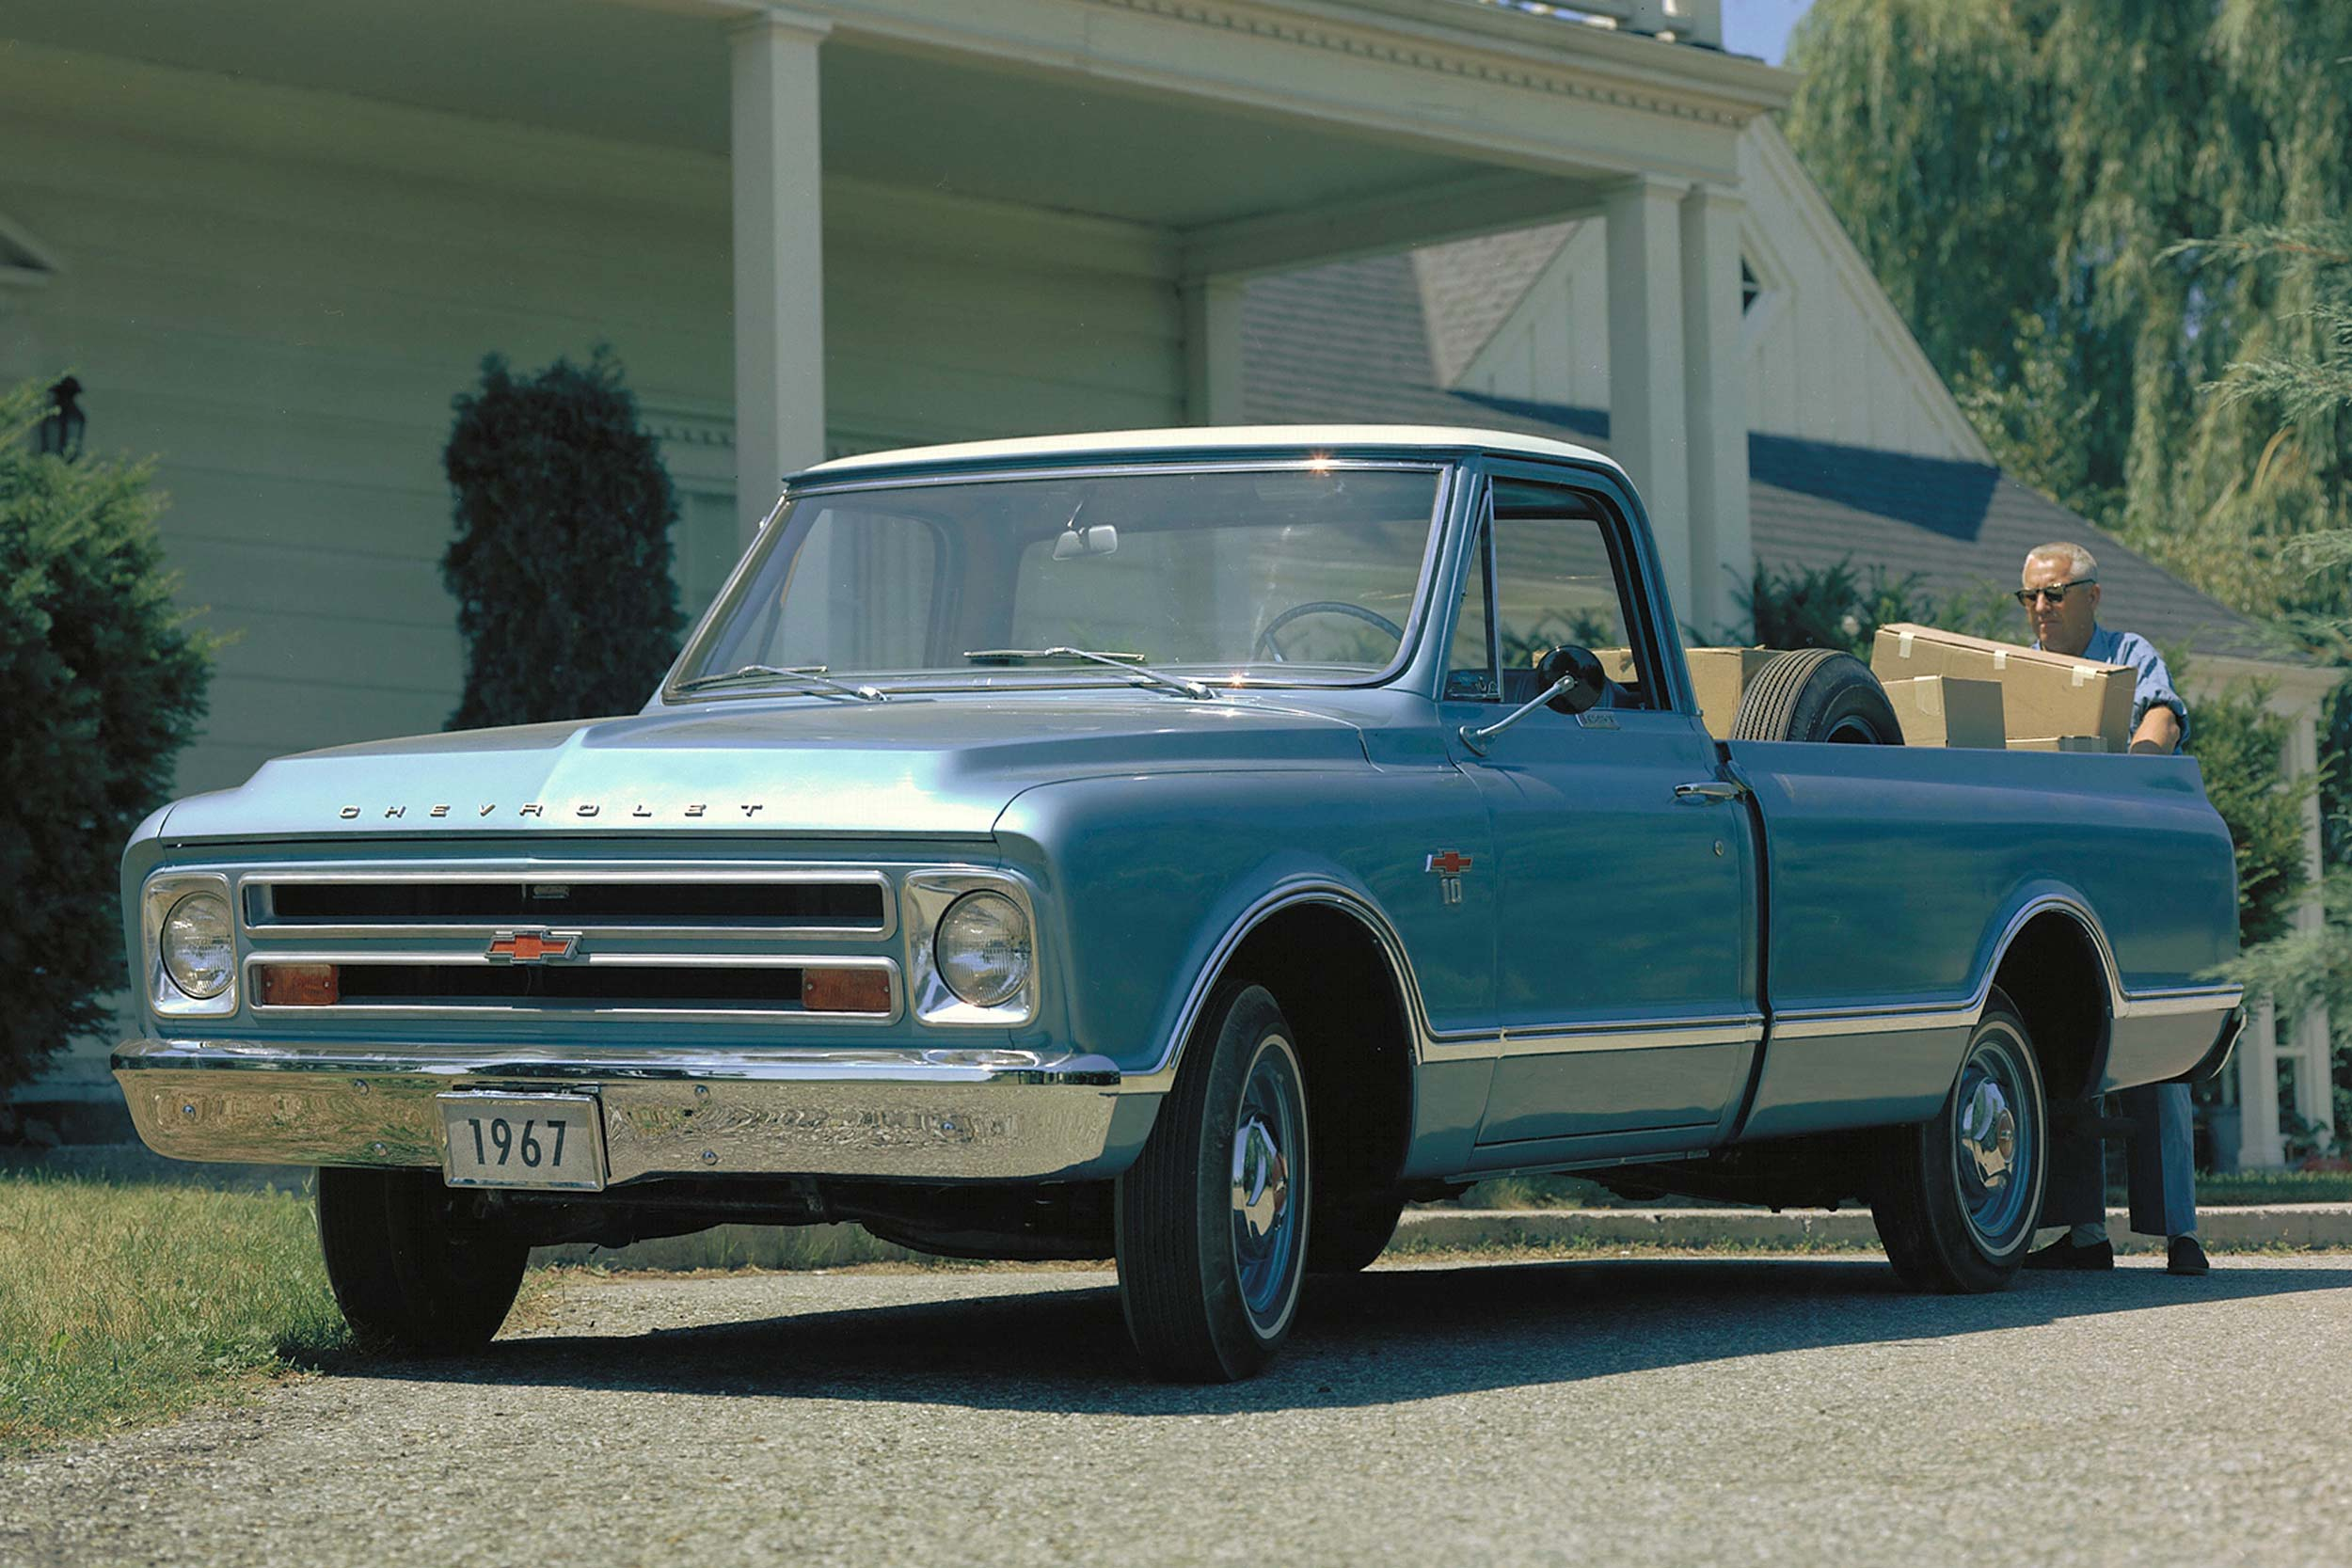 1967 Chevrolet C10 Series Half Ton Pickup